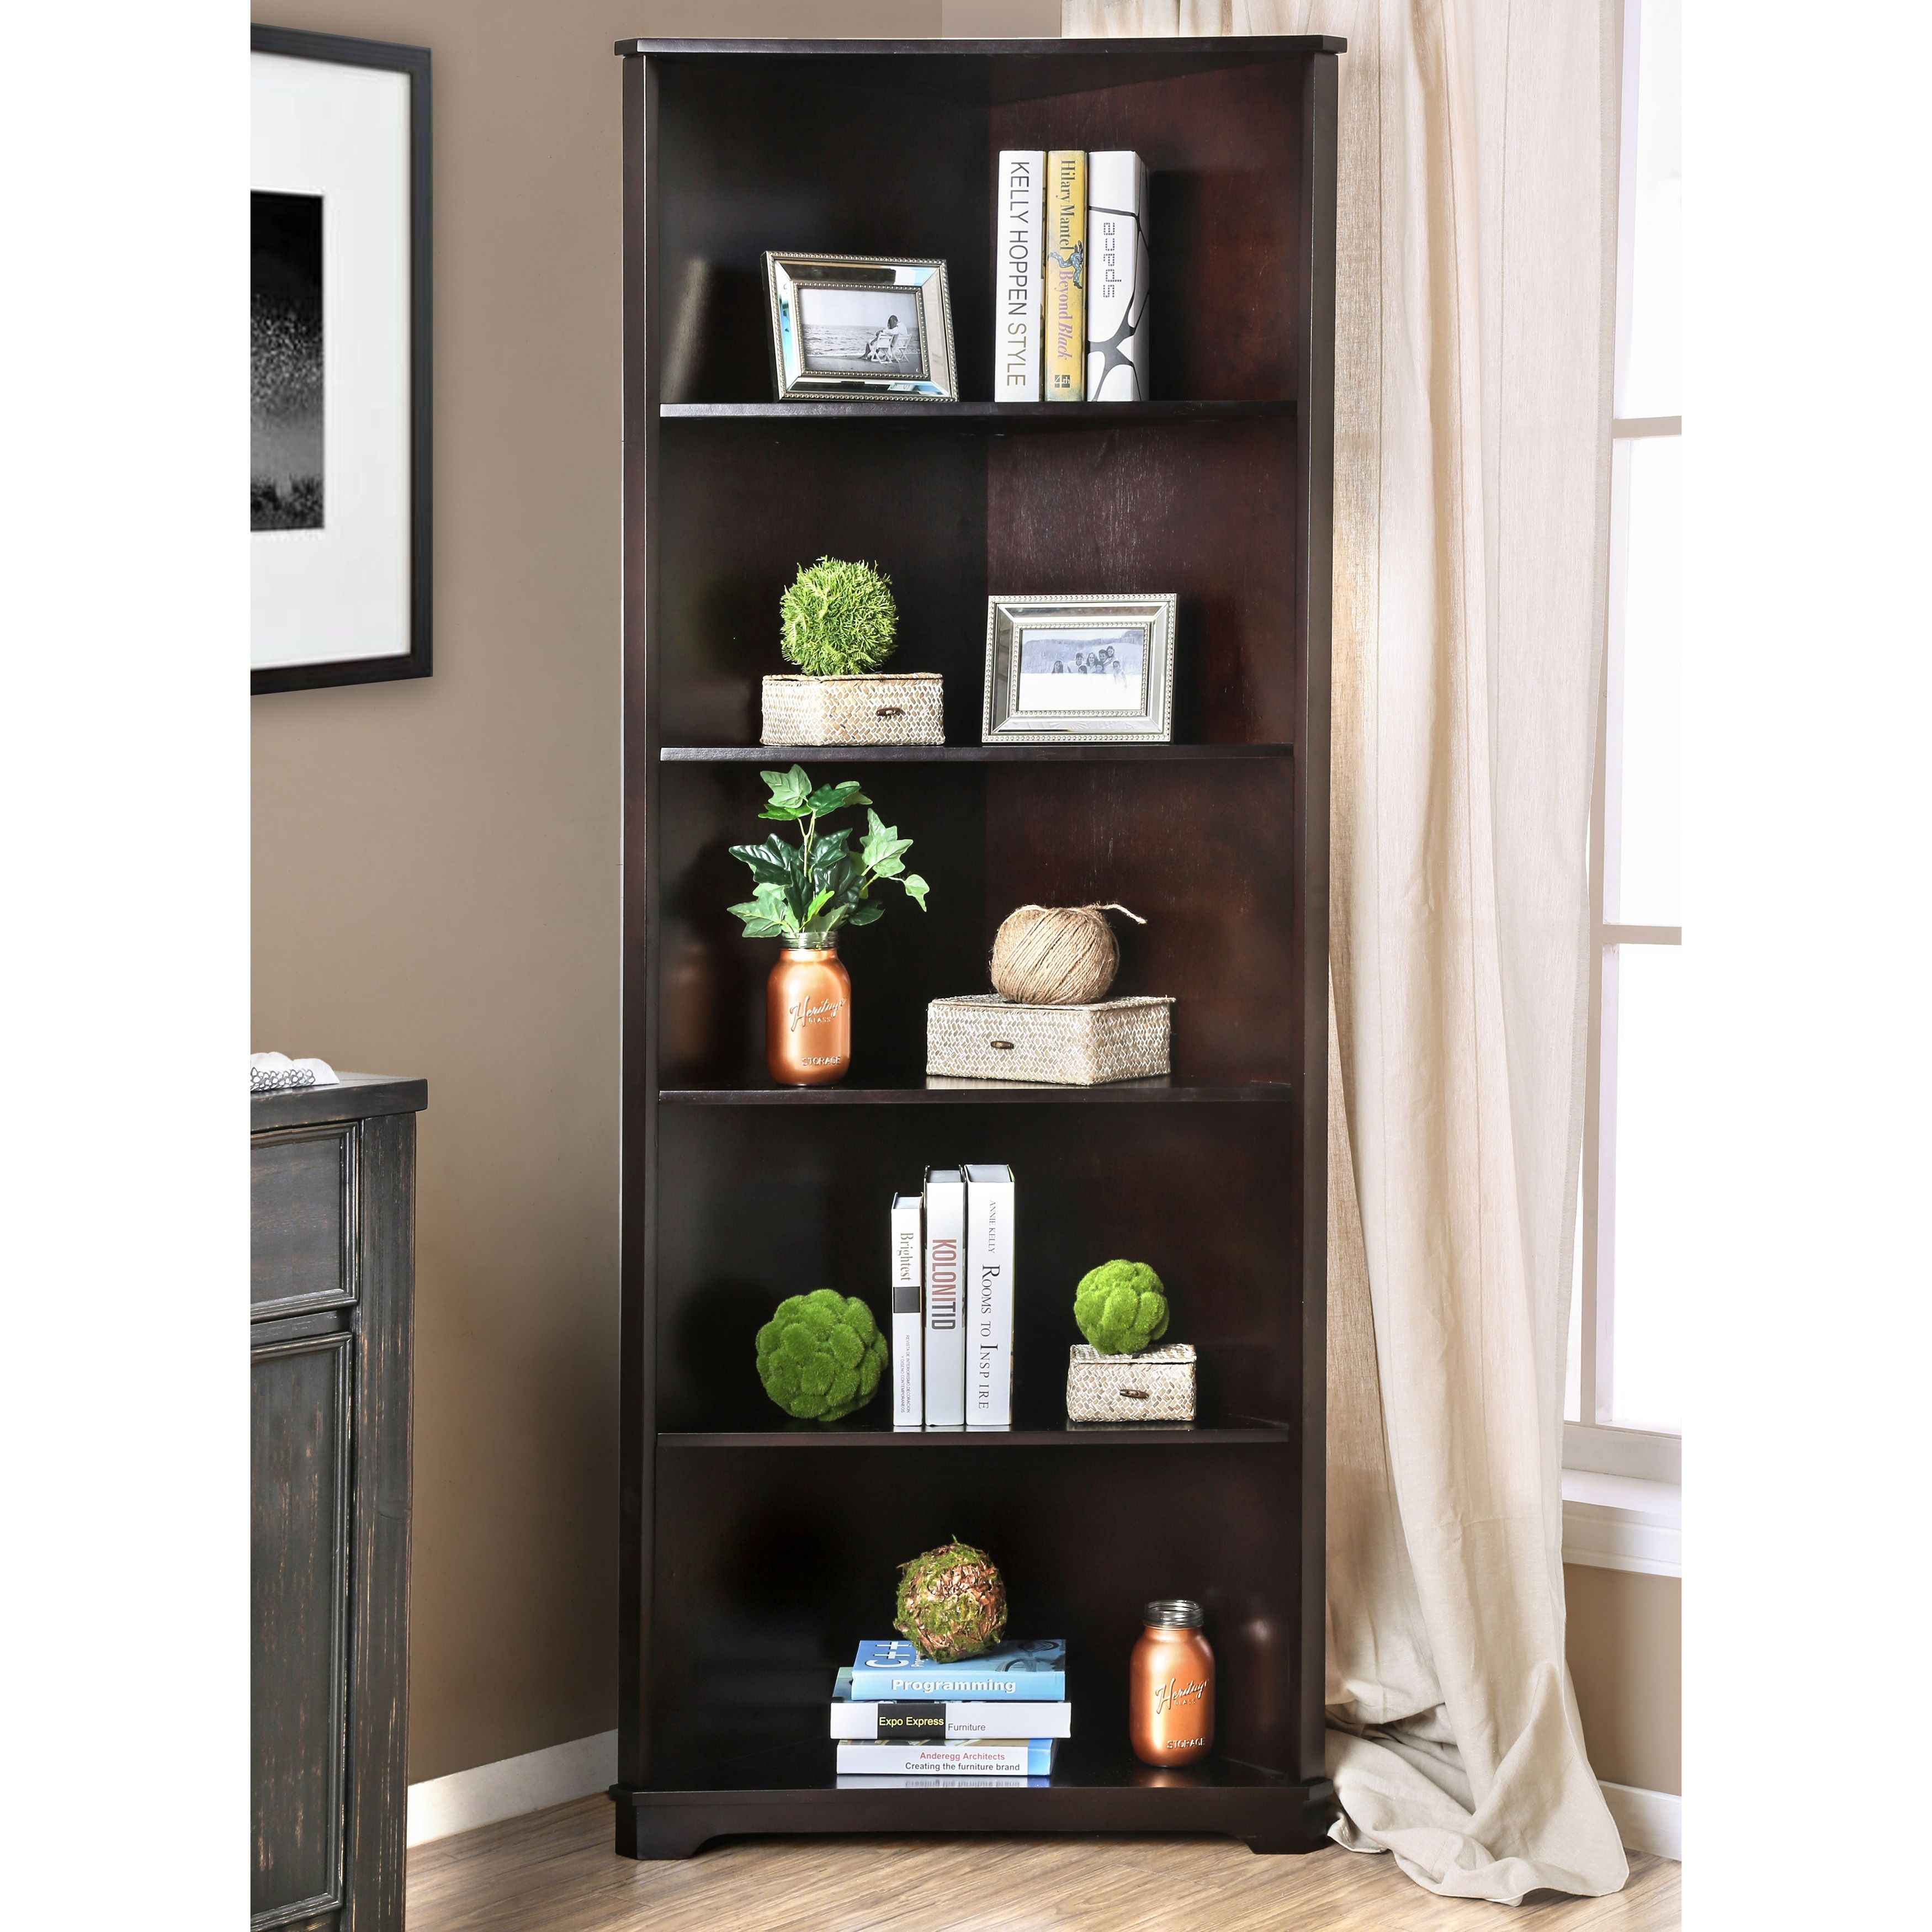 Furniture Of America Copley Wood Contemporary 5 Tier Corner Bookshelf Espresso Brown